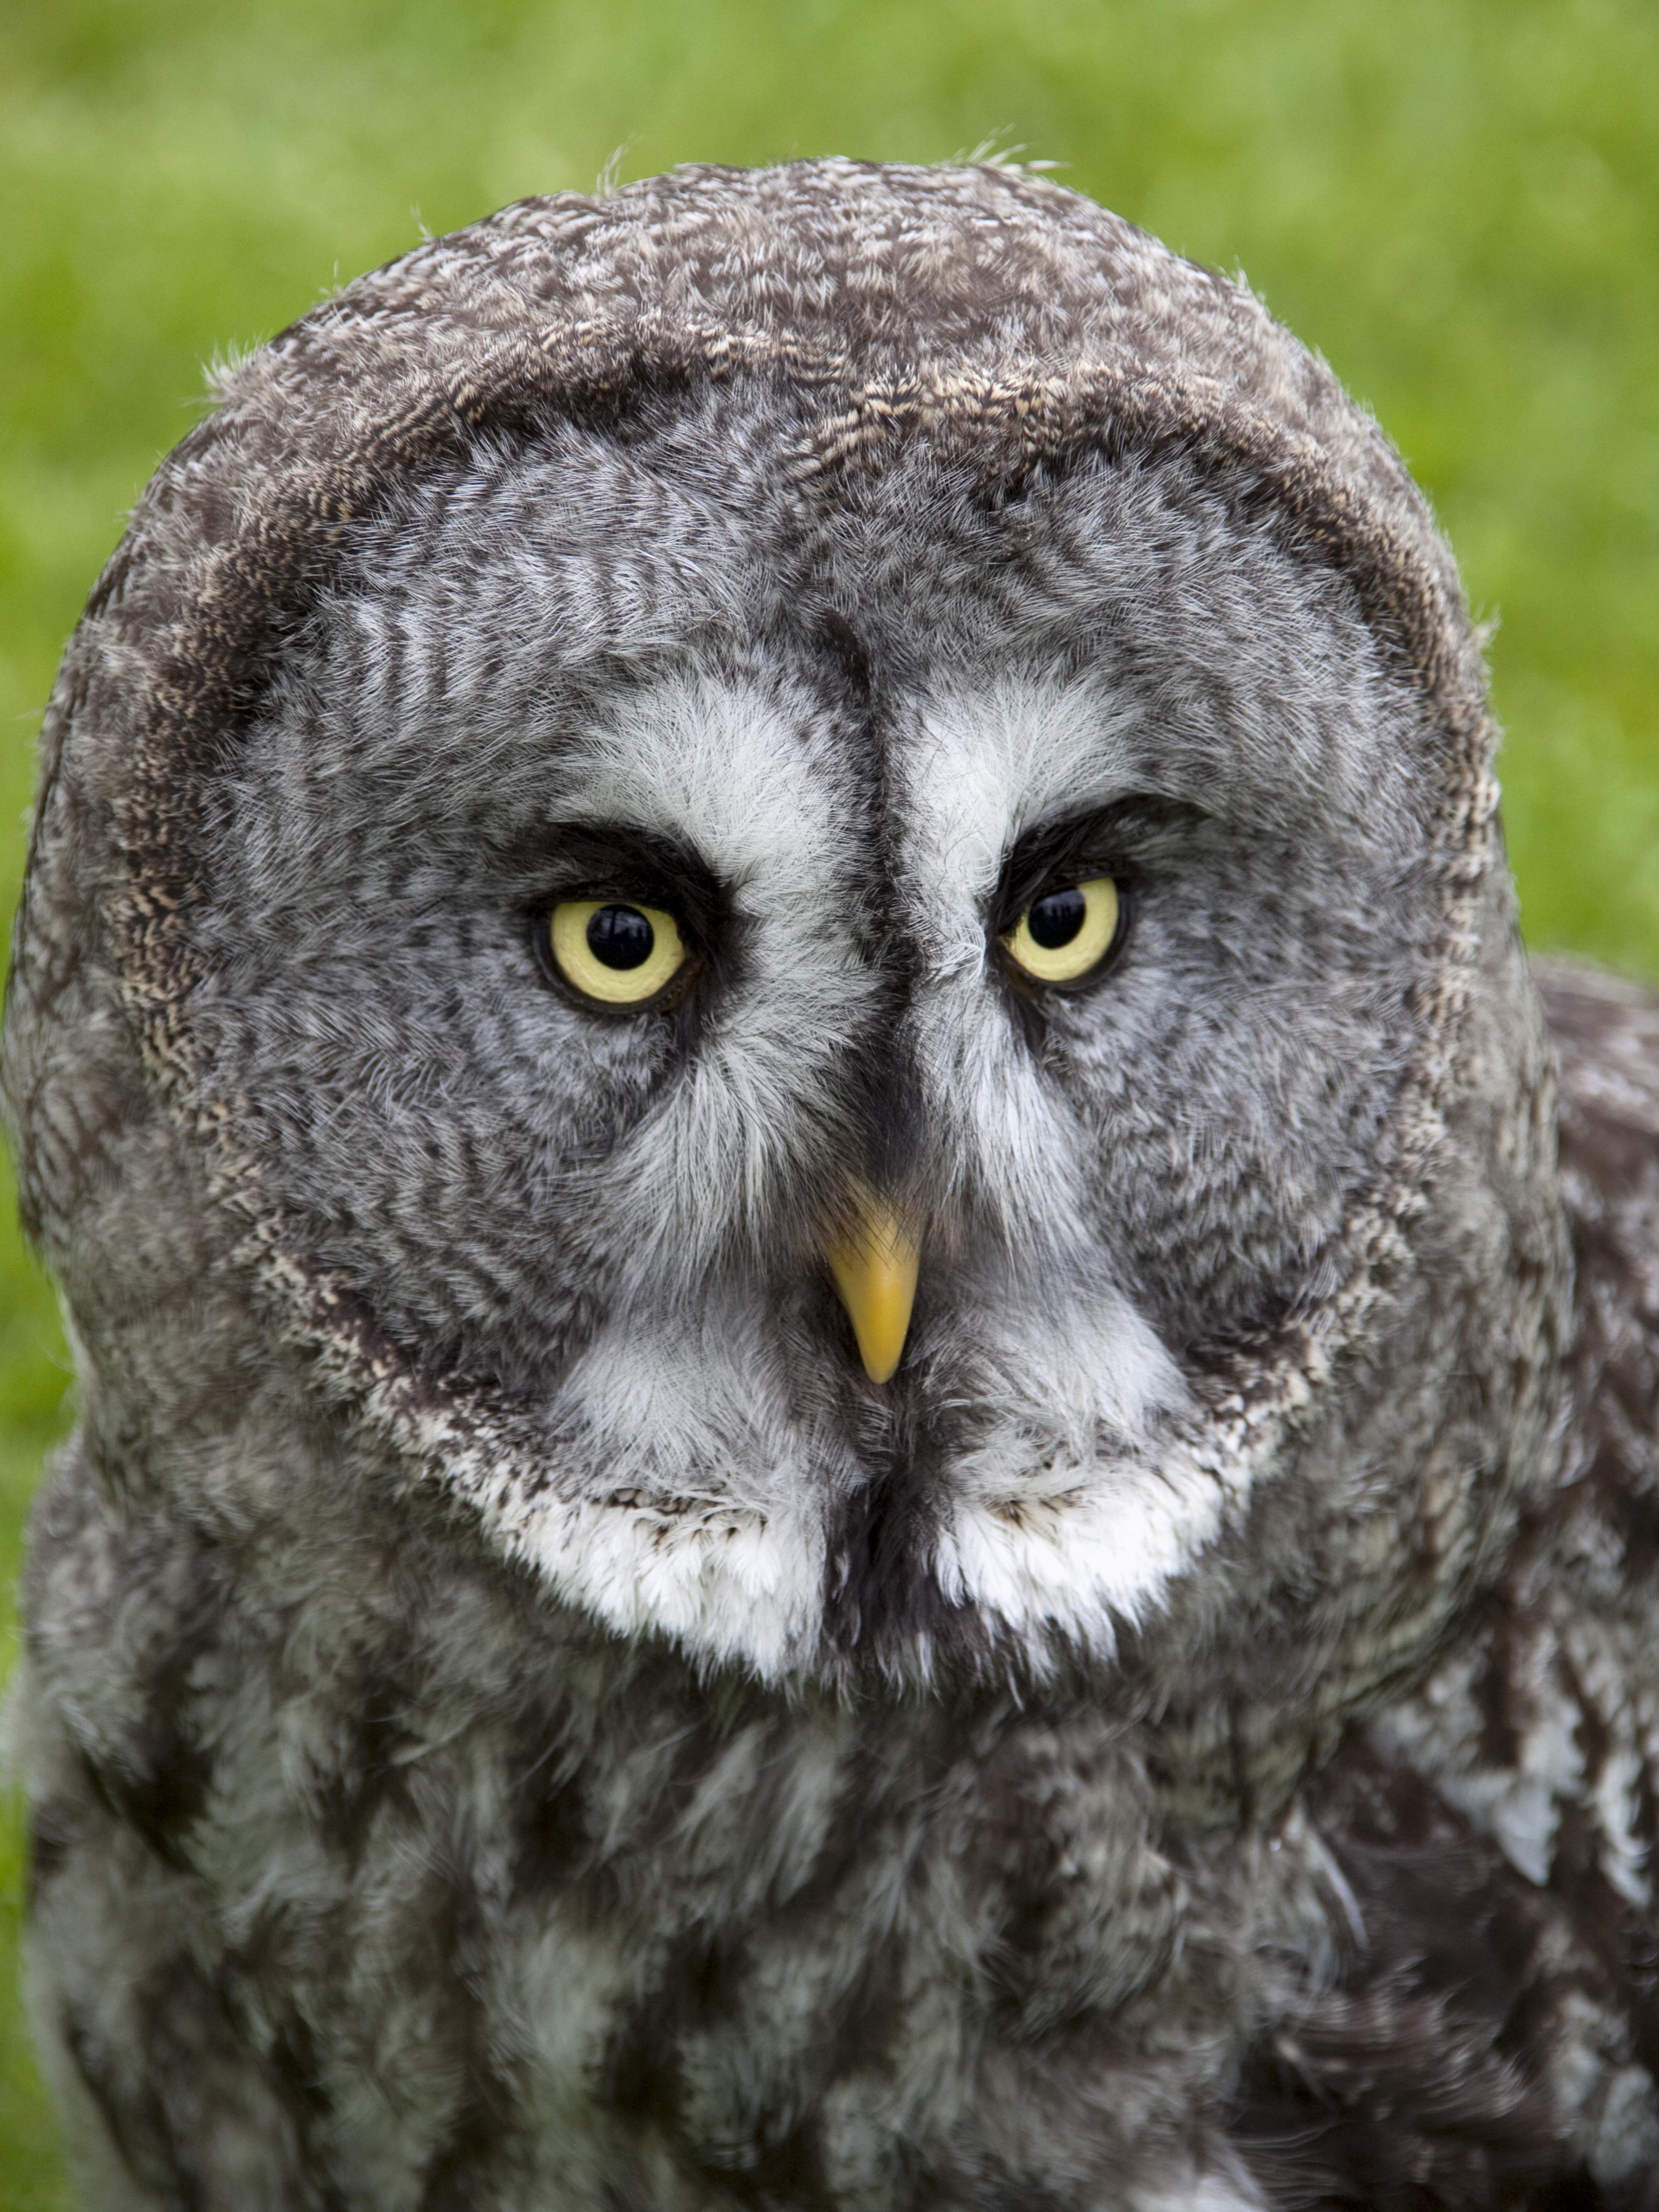 File:Great Grey Owl 2 (4570453977).jpg - Wikimedia Commons